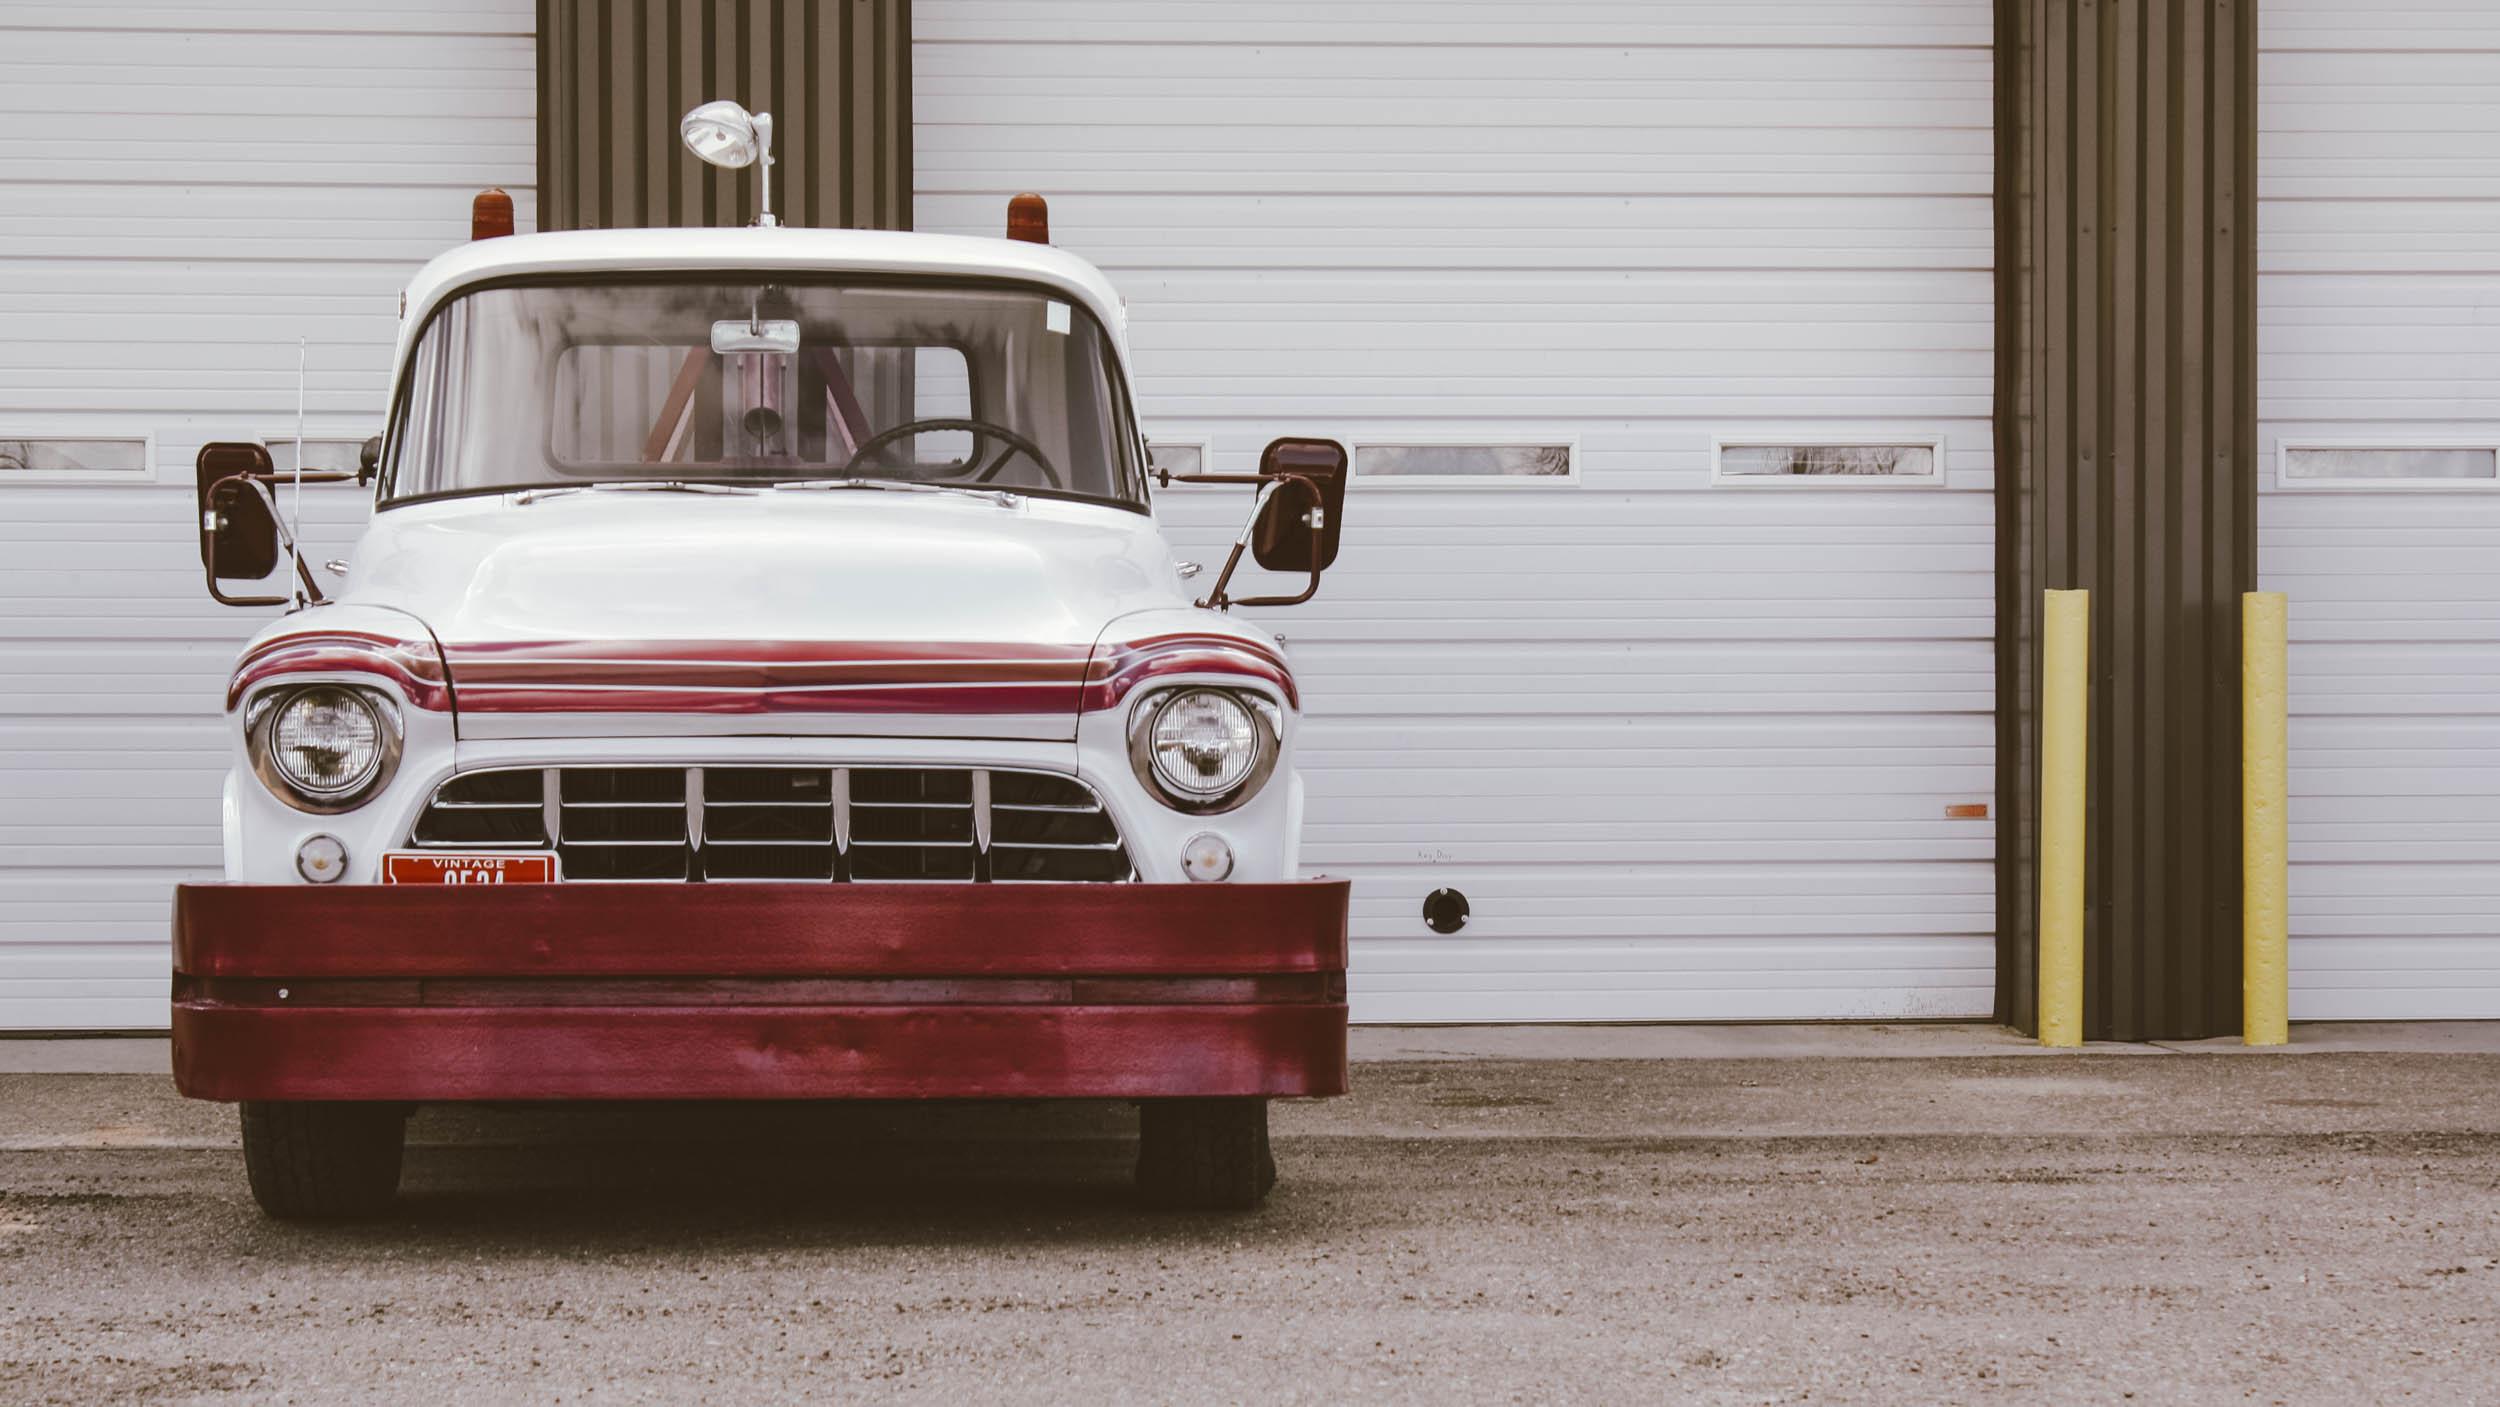 1955 Chevrolet Wrecker Front